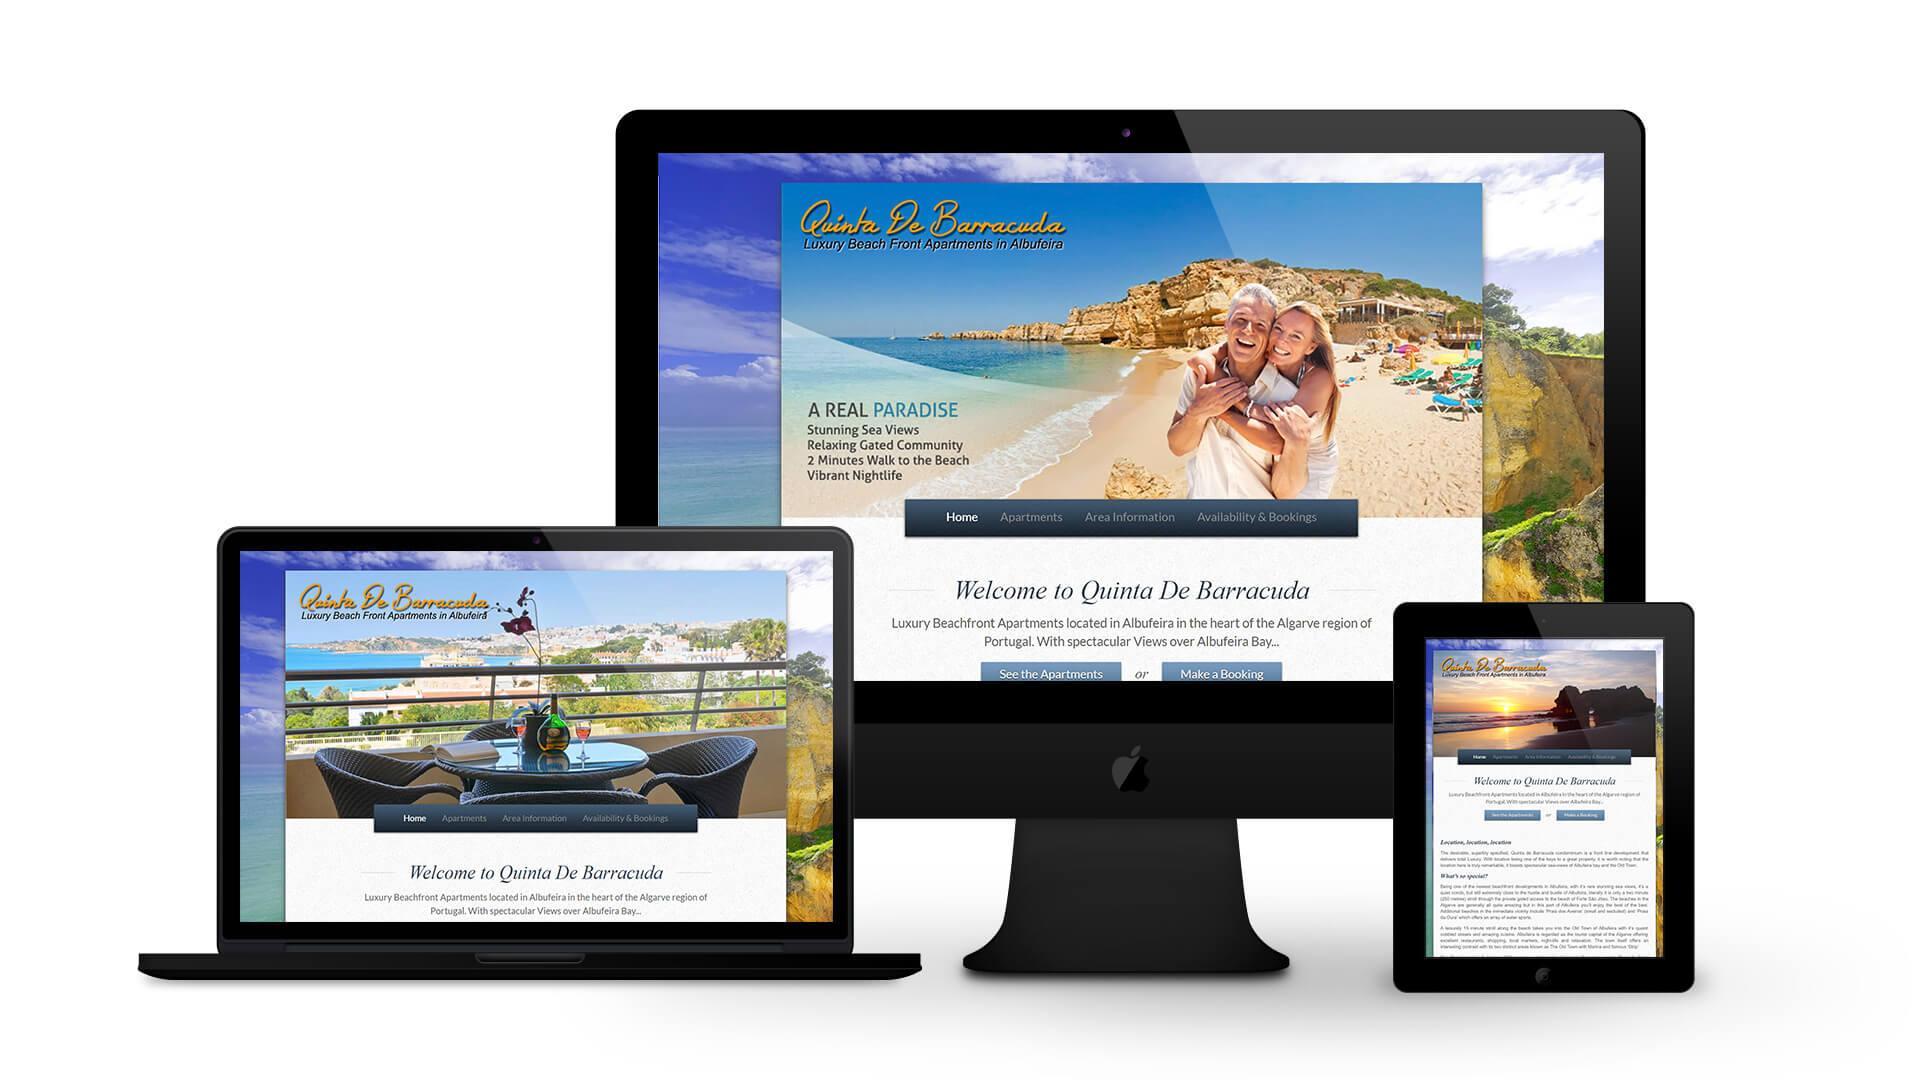 Algarve Beach Apartments - By Ice Cube Web Design